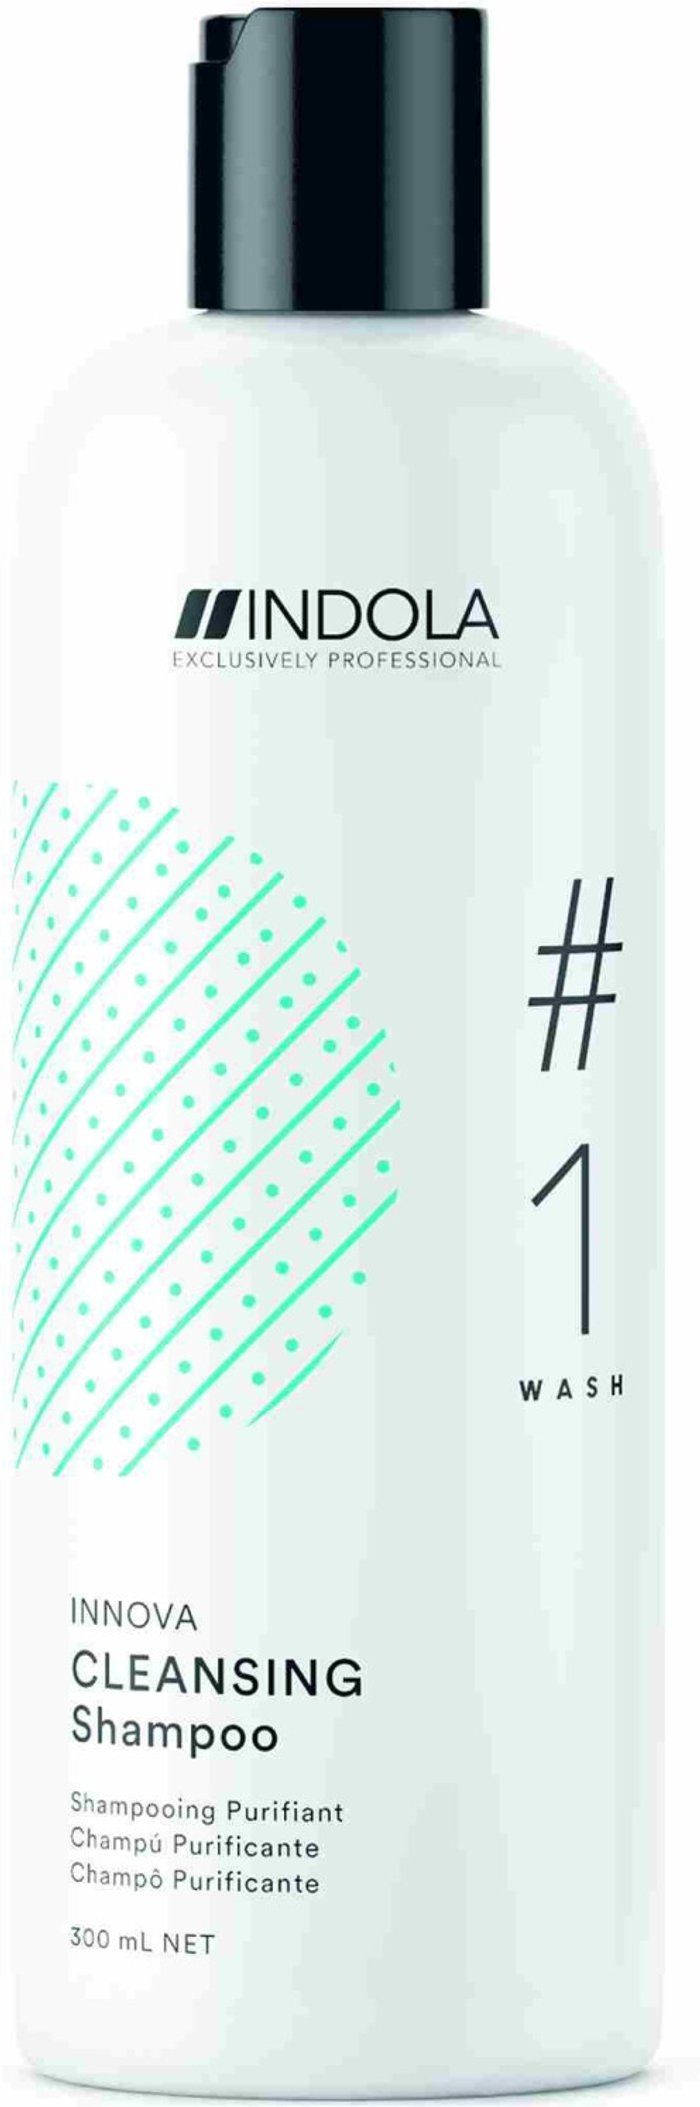 Indola Indola Innova Cleansing Shampoo (300 ml)